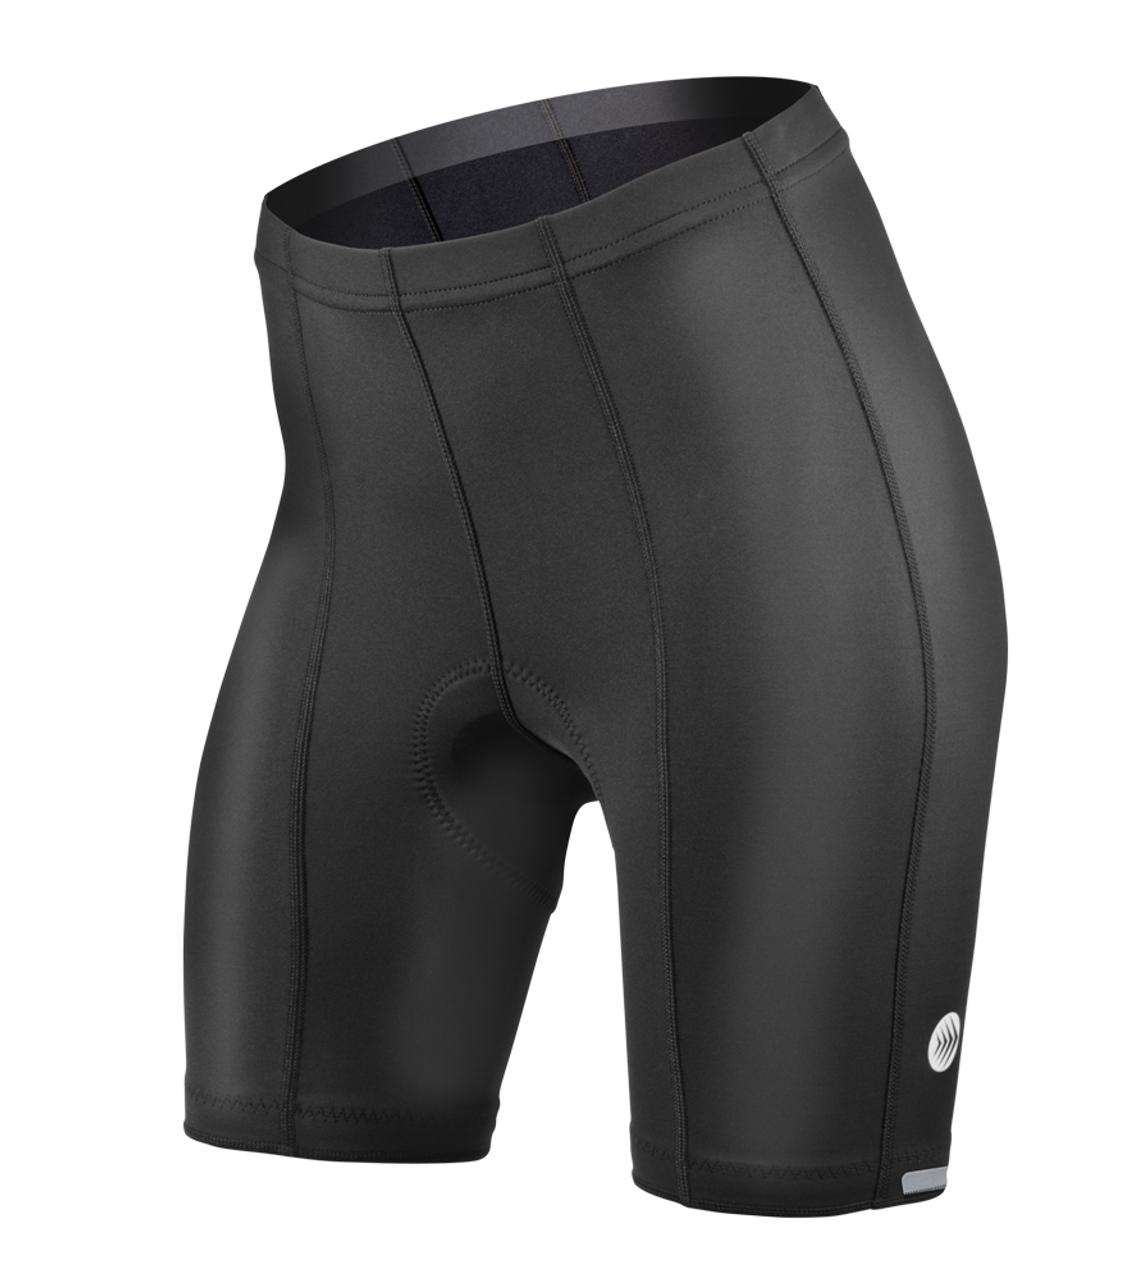 How to padded wear bike shorts rare photo